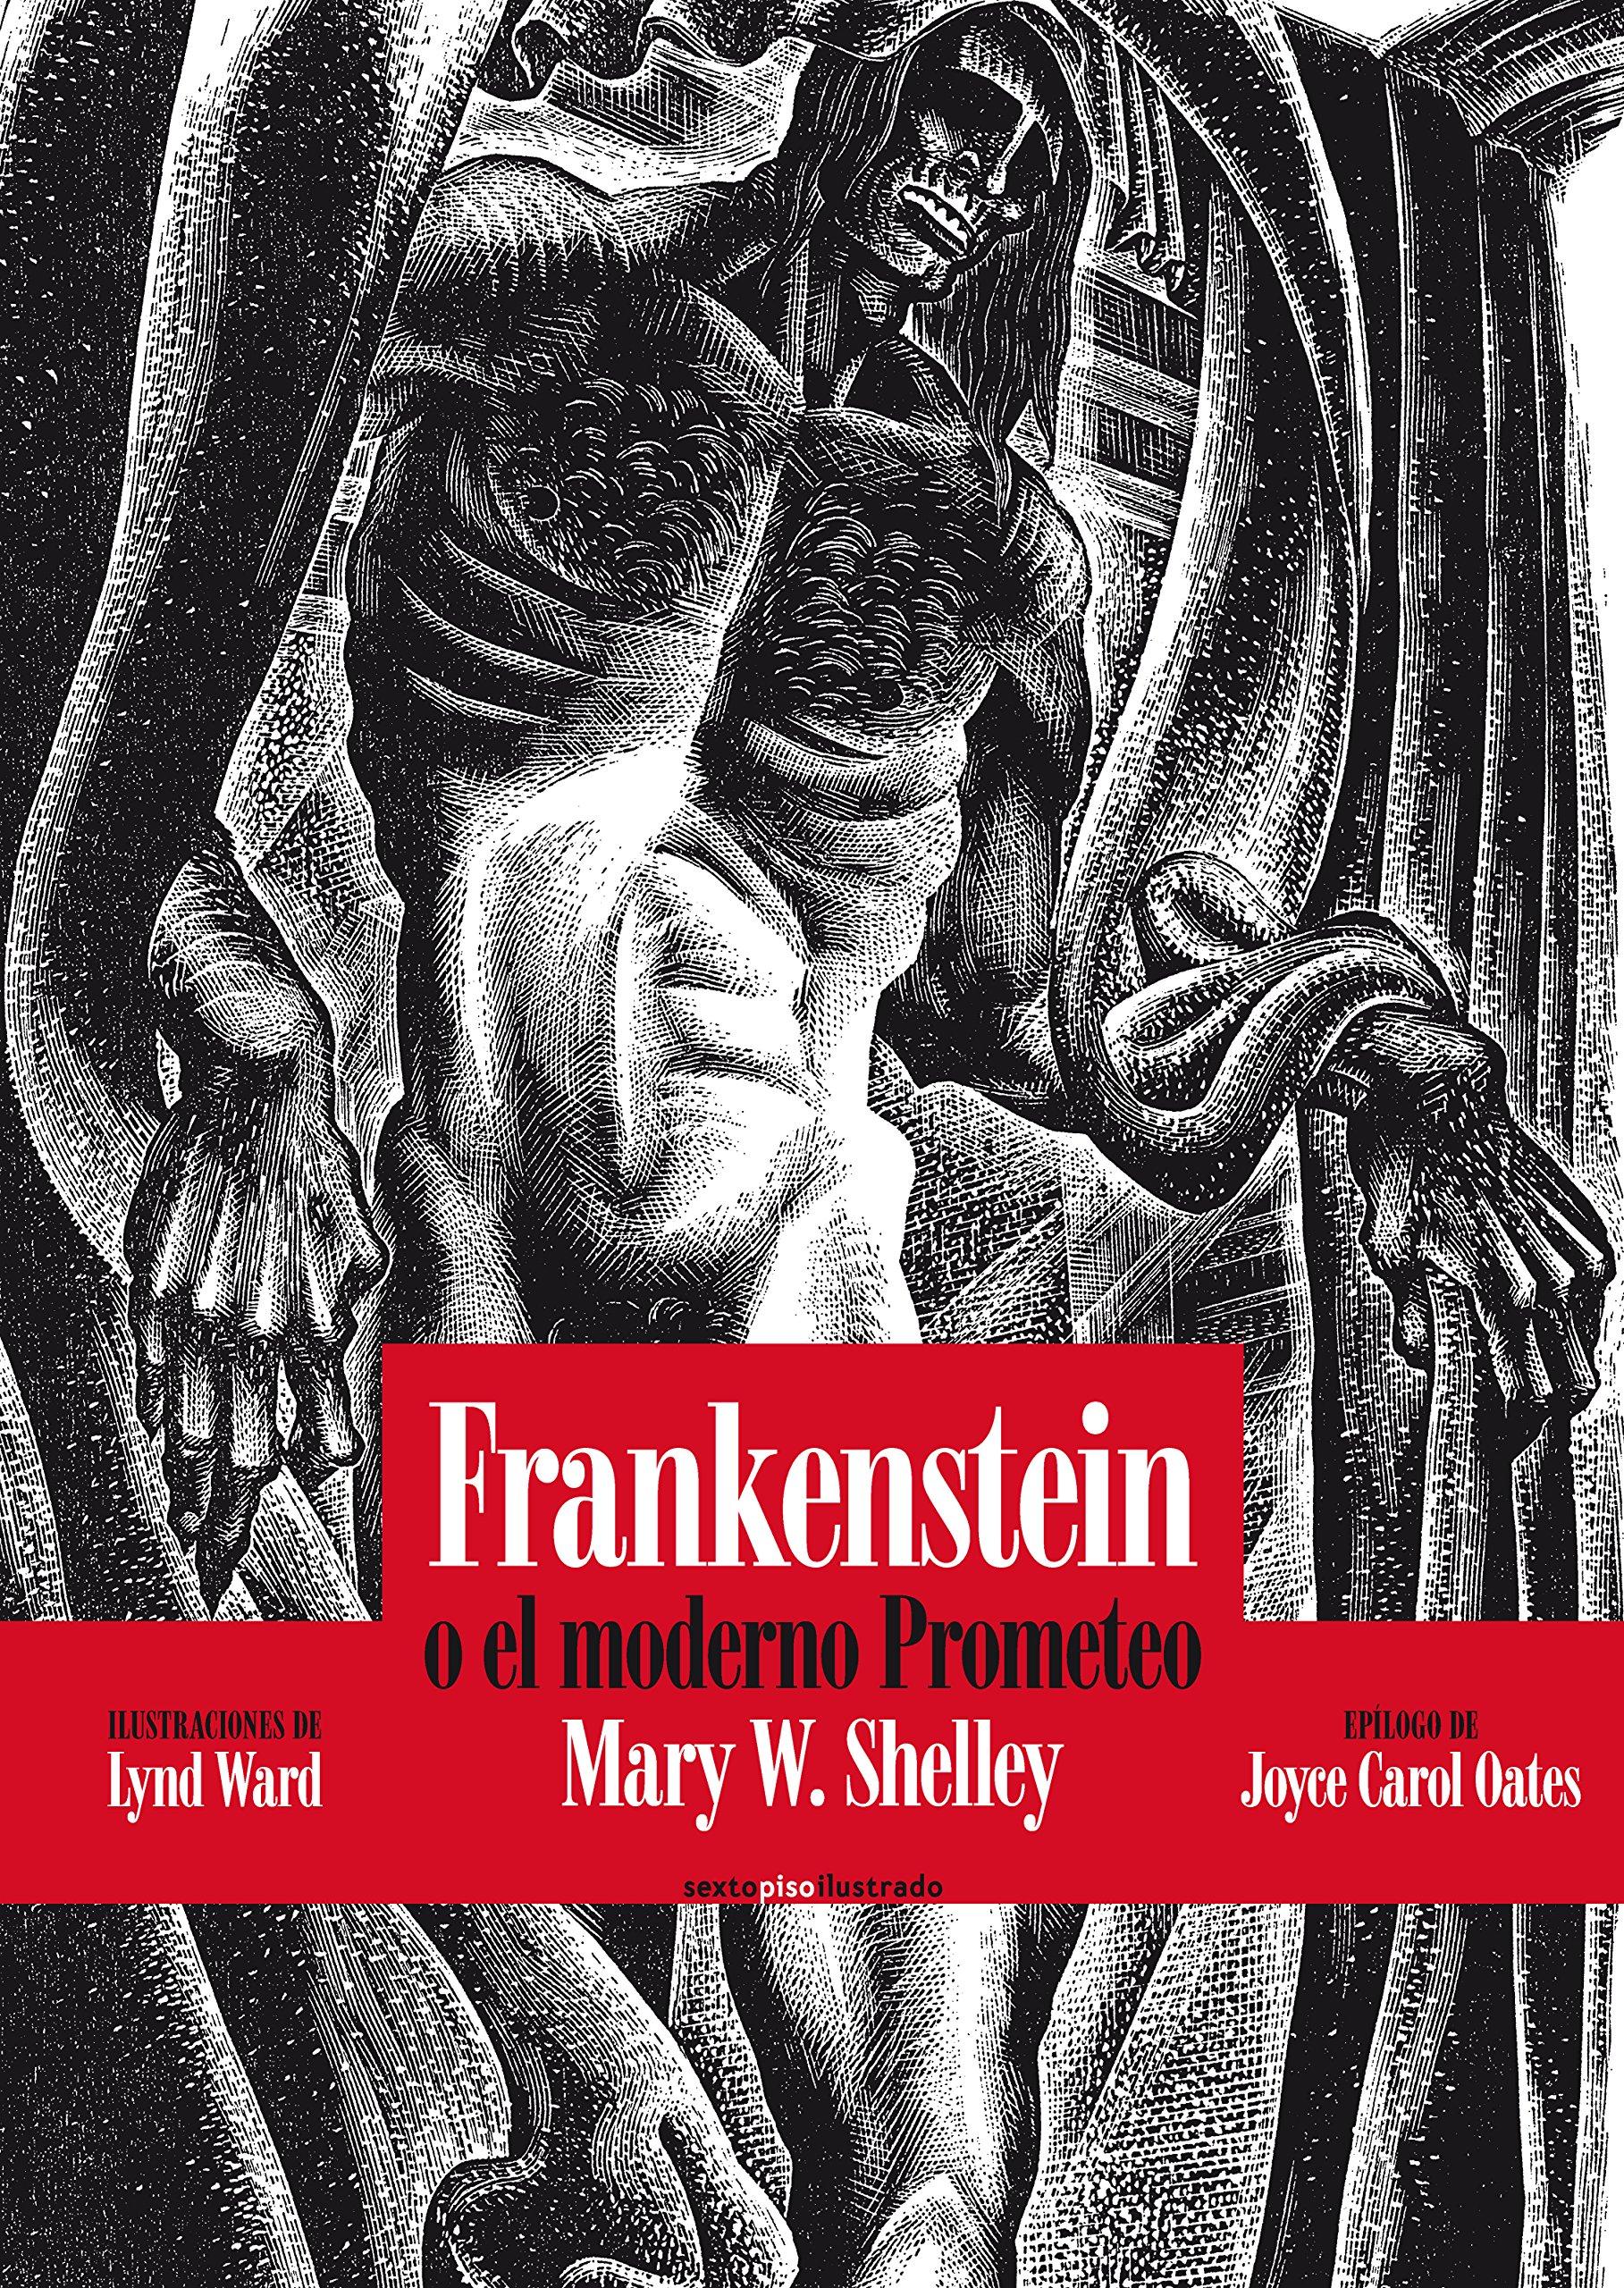 Frankenstein (Sexto Piso Ilustrado): Amazon.es: Mary Shelley, Lynd Ward, Joyce Carol Oates, Rafael Torres Pabón: Libros